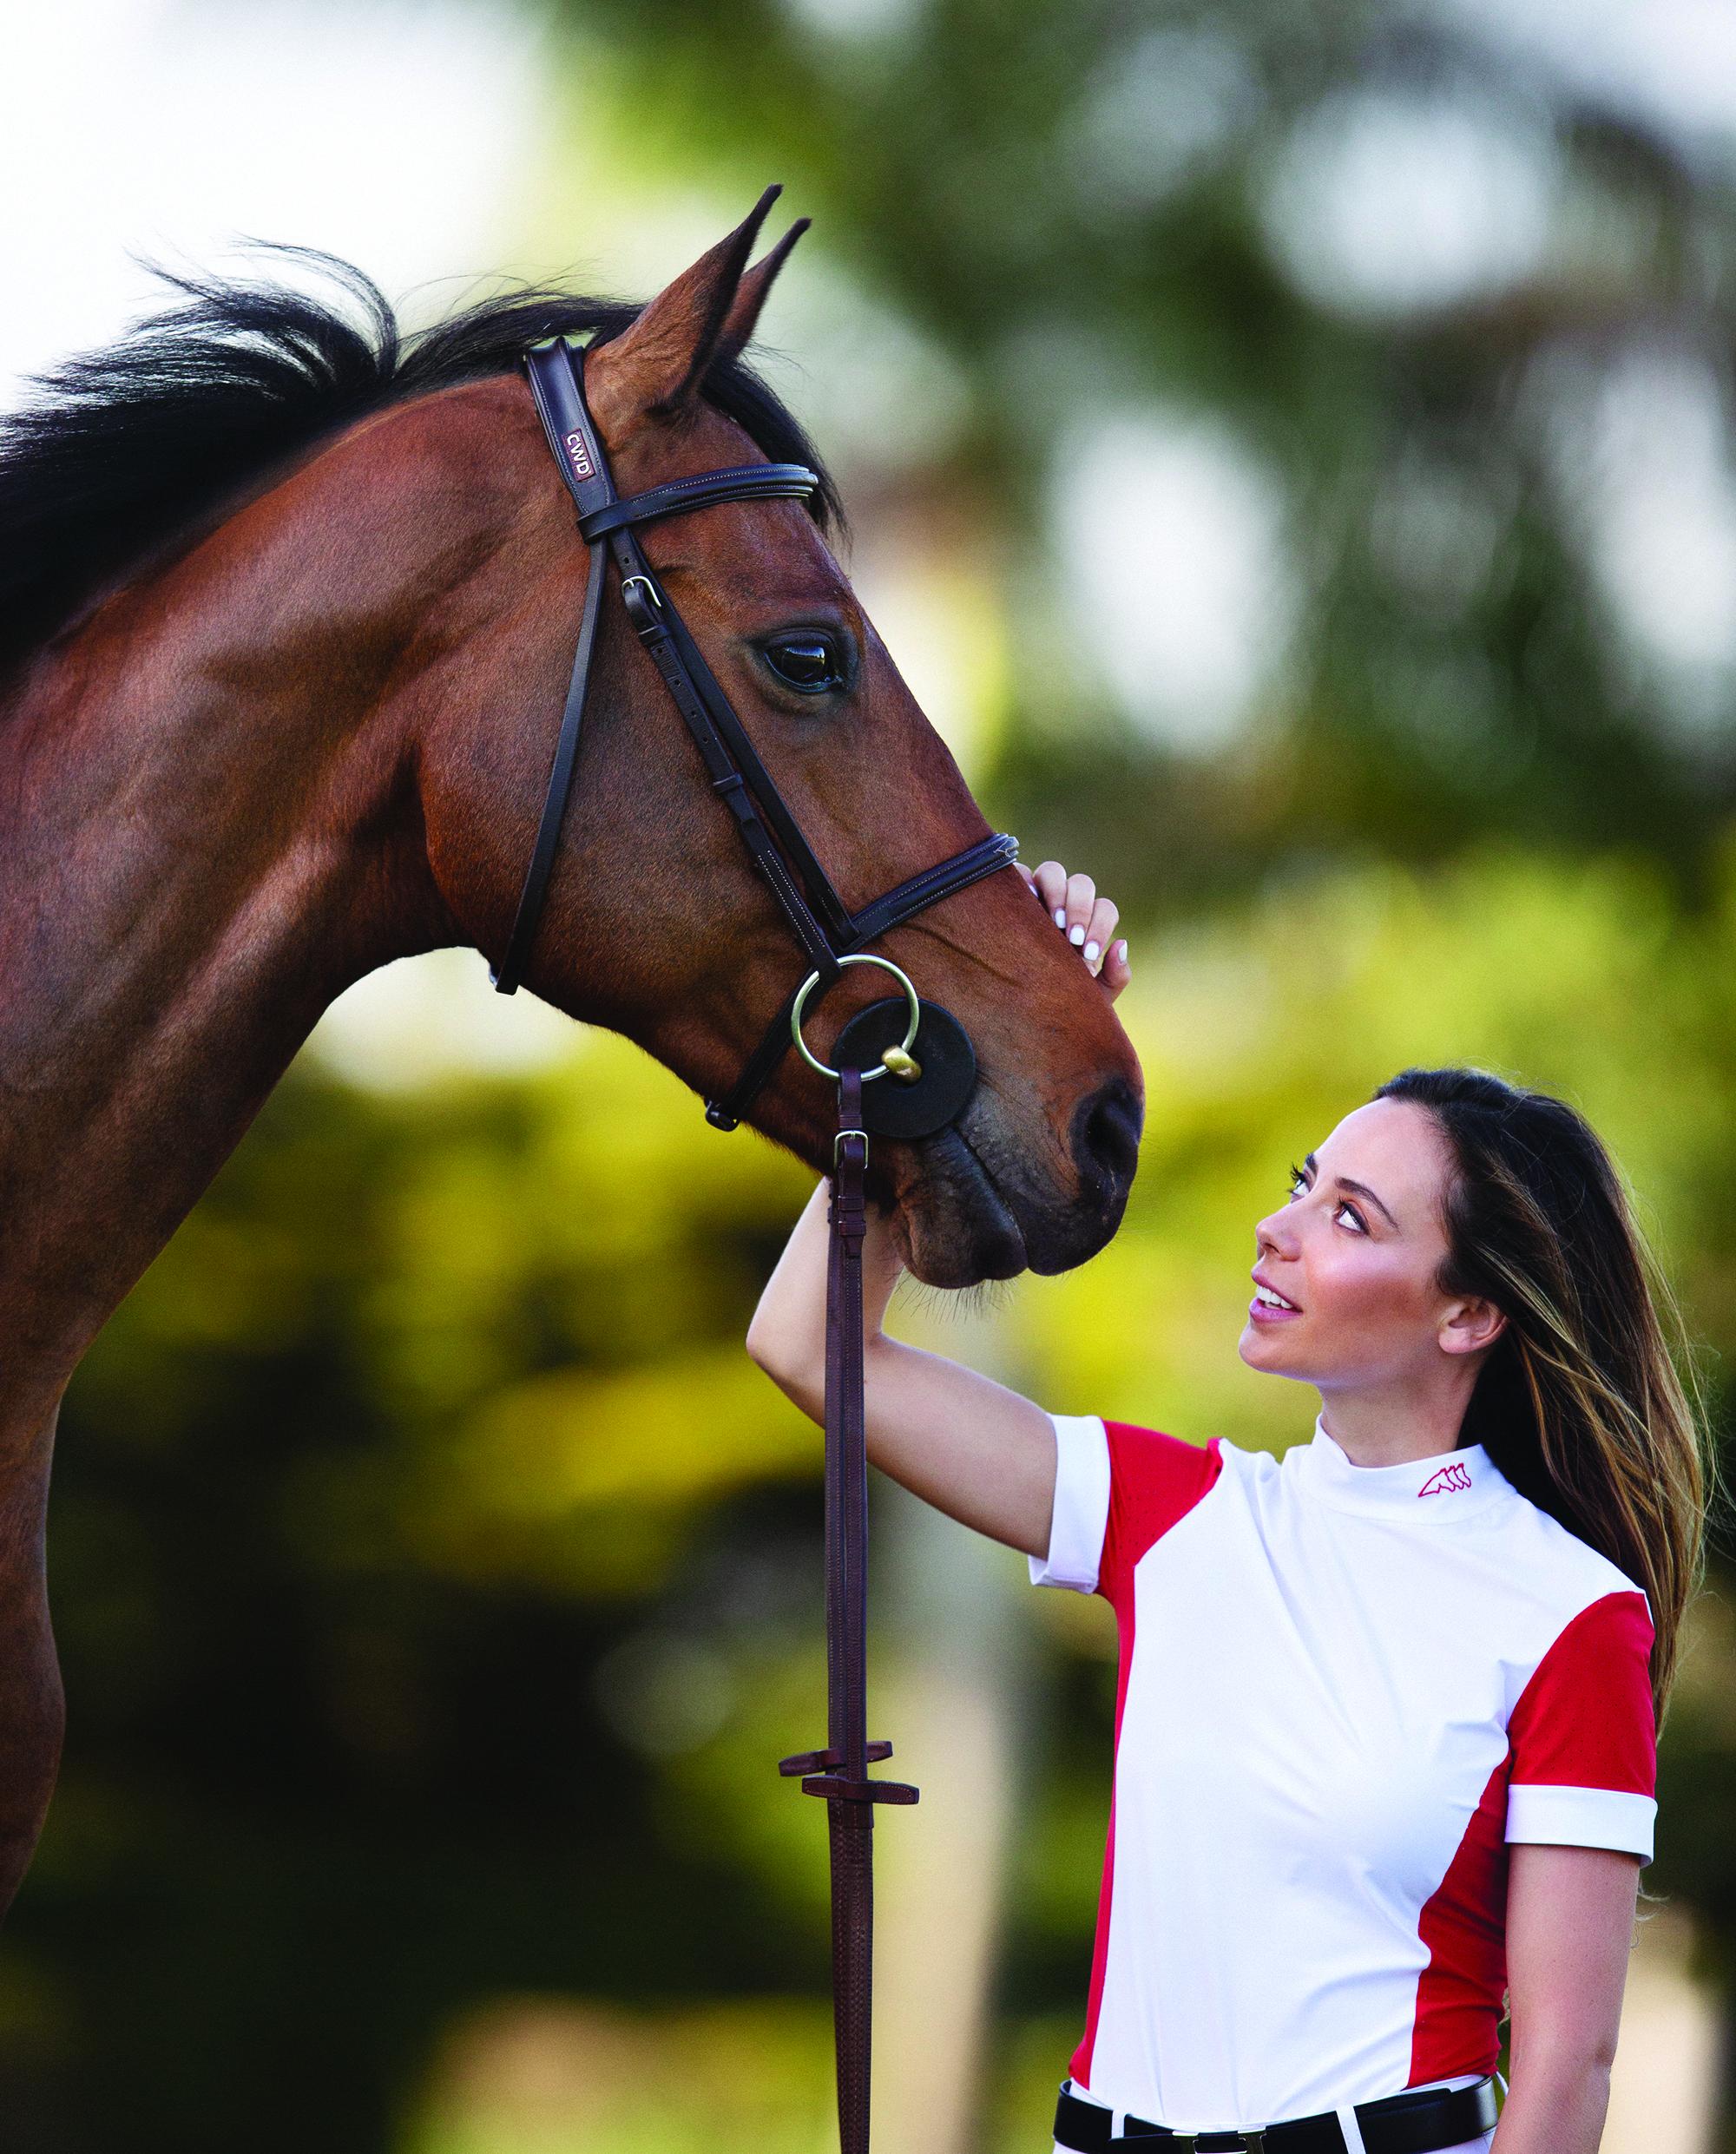 Kaval_Model+Horse.jpeg